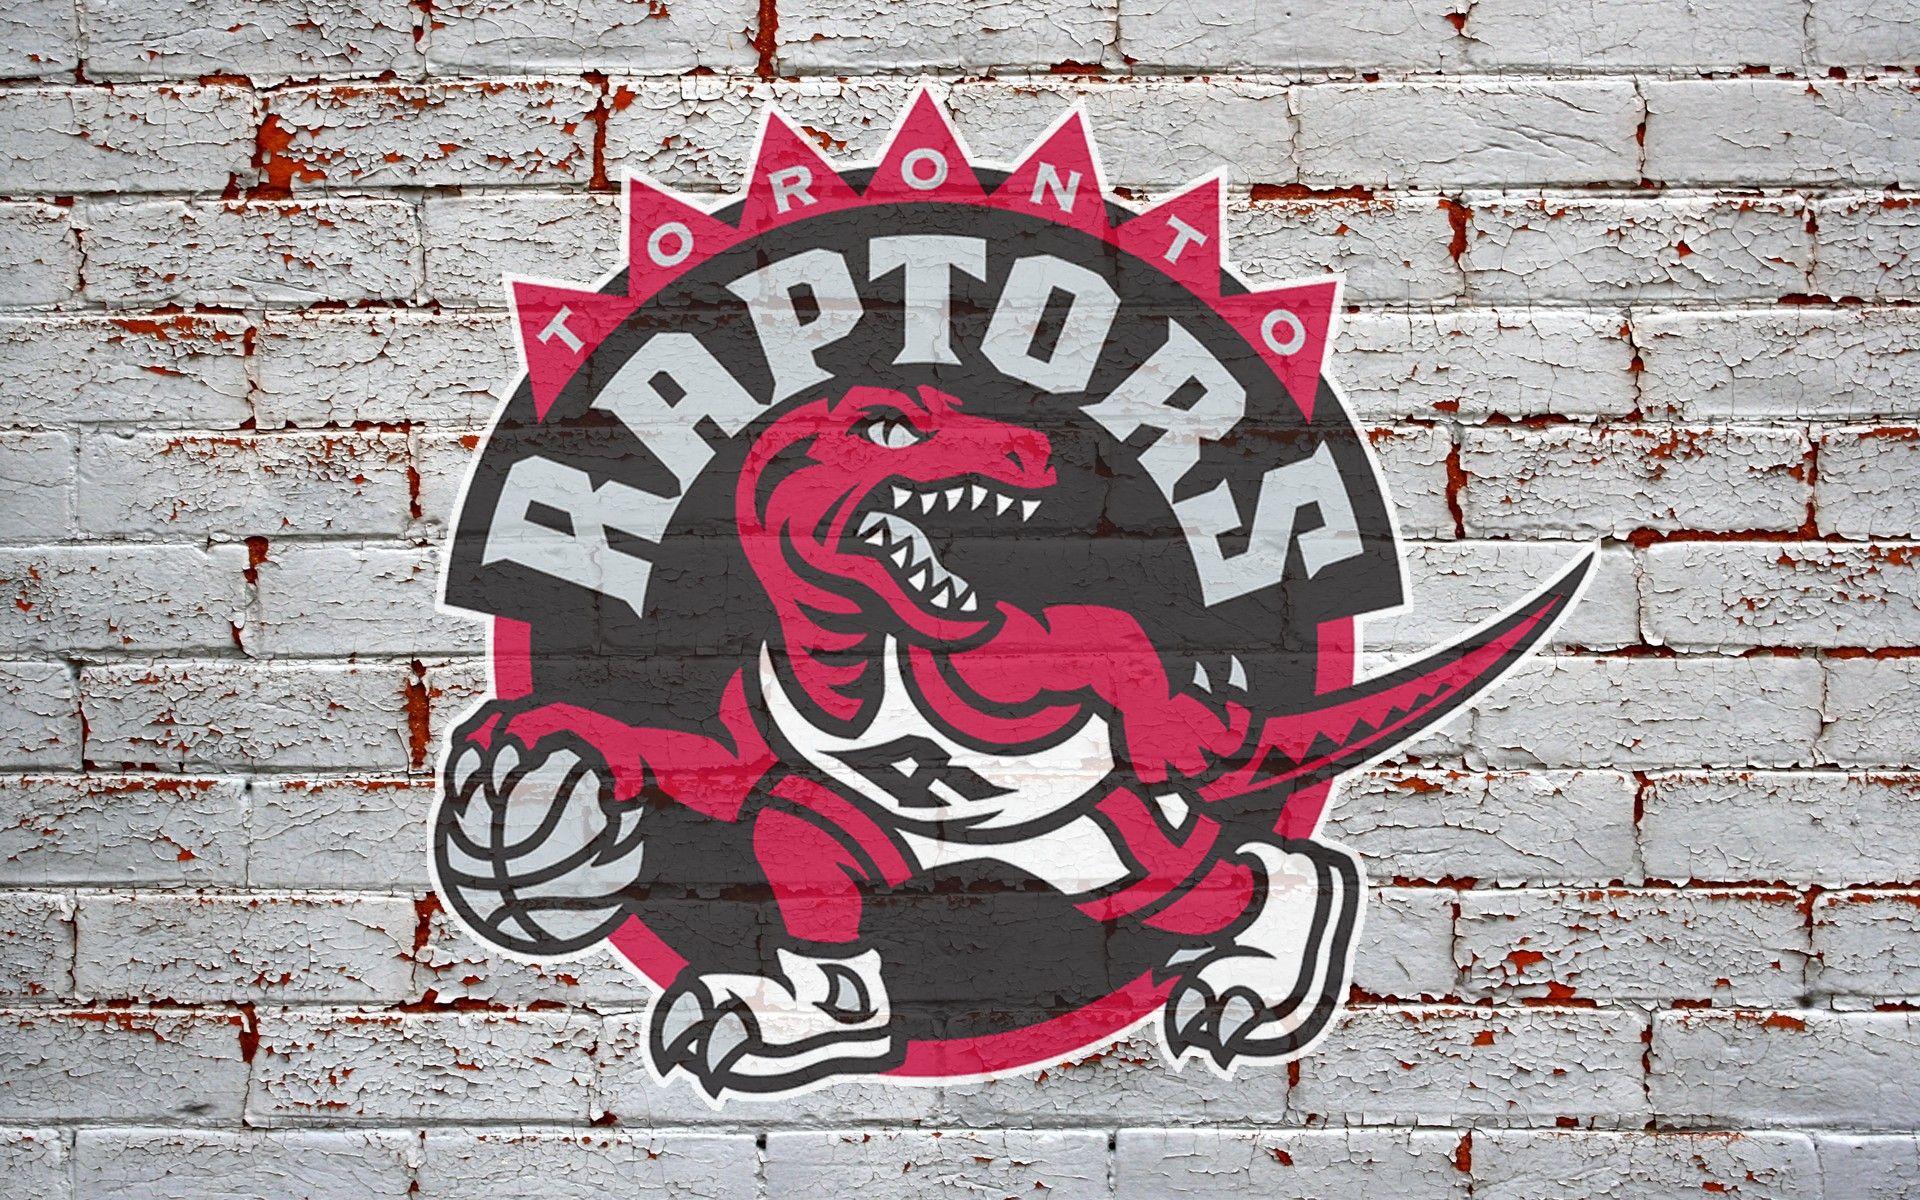 Toronto Raptors Wallpaper Raptors Wallpaper Toronto Raptors Basketball Wallpaper